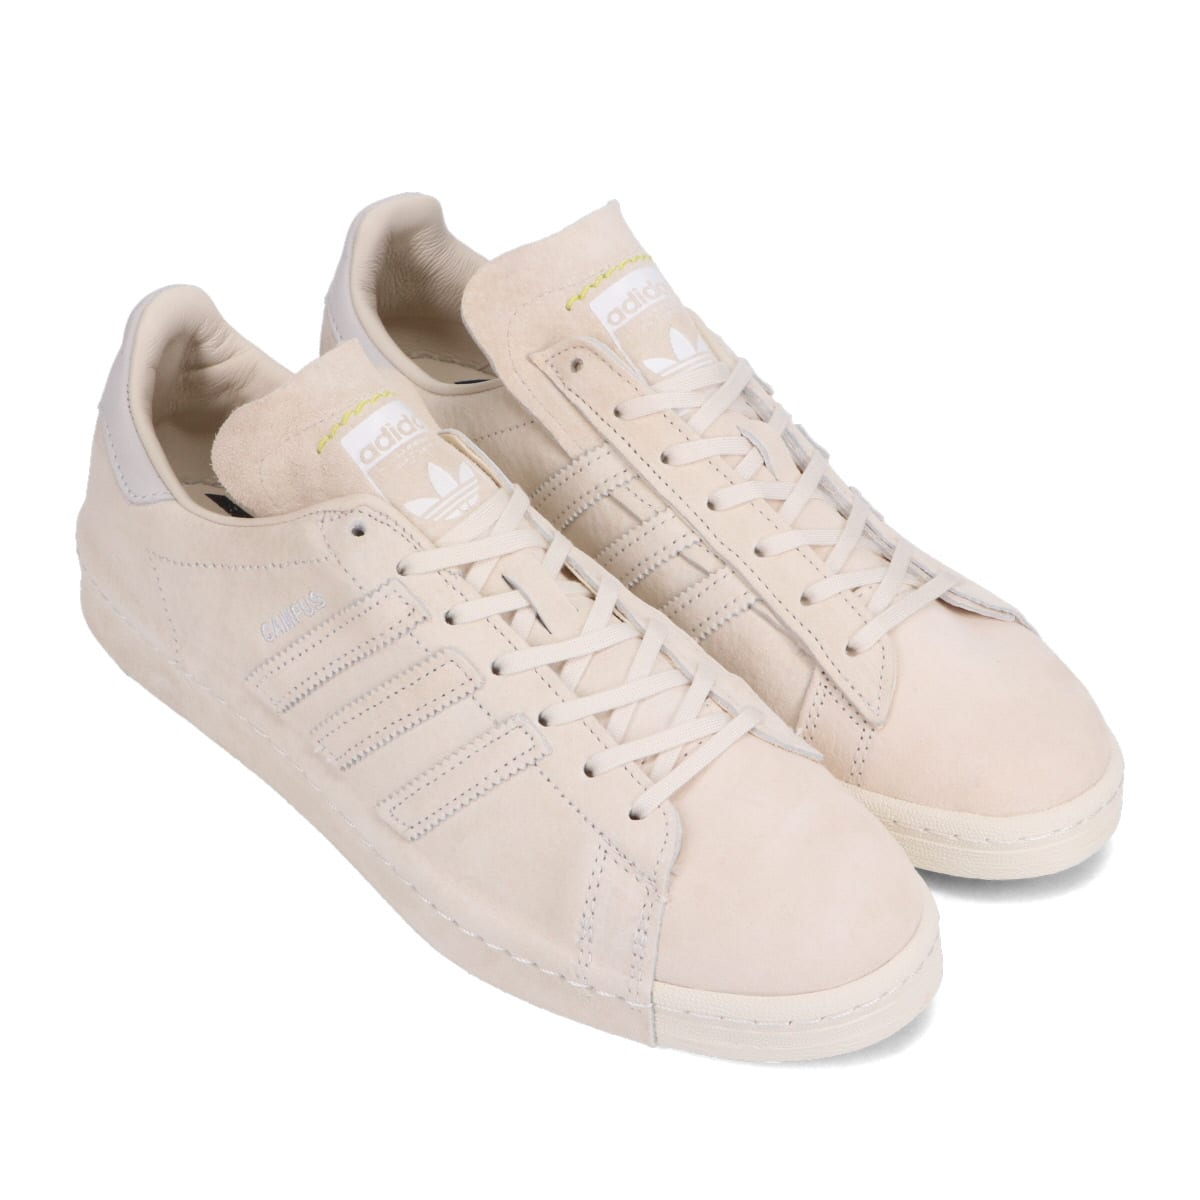 adidas CAMPUS 80S SH CHALK WHITE/GREY THREE/CORE BLACK 20FW-S_photo_large